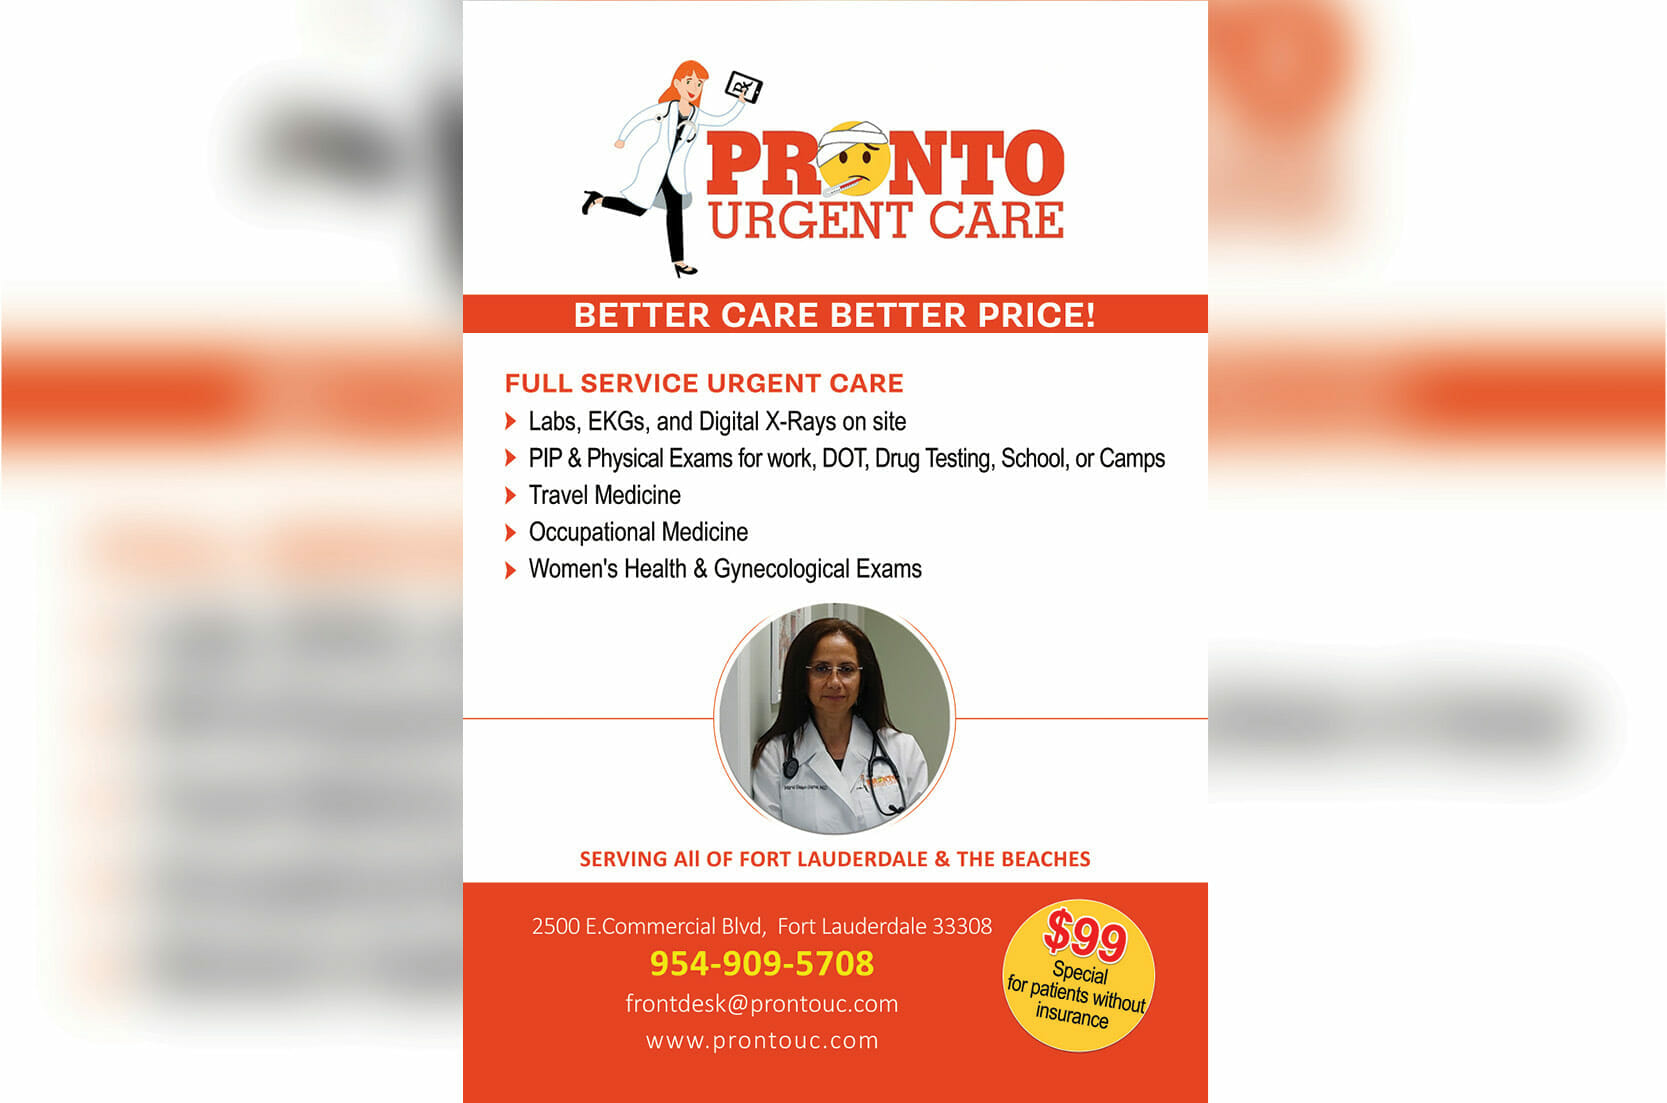 Get Your Urgent Care – Pronto!